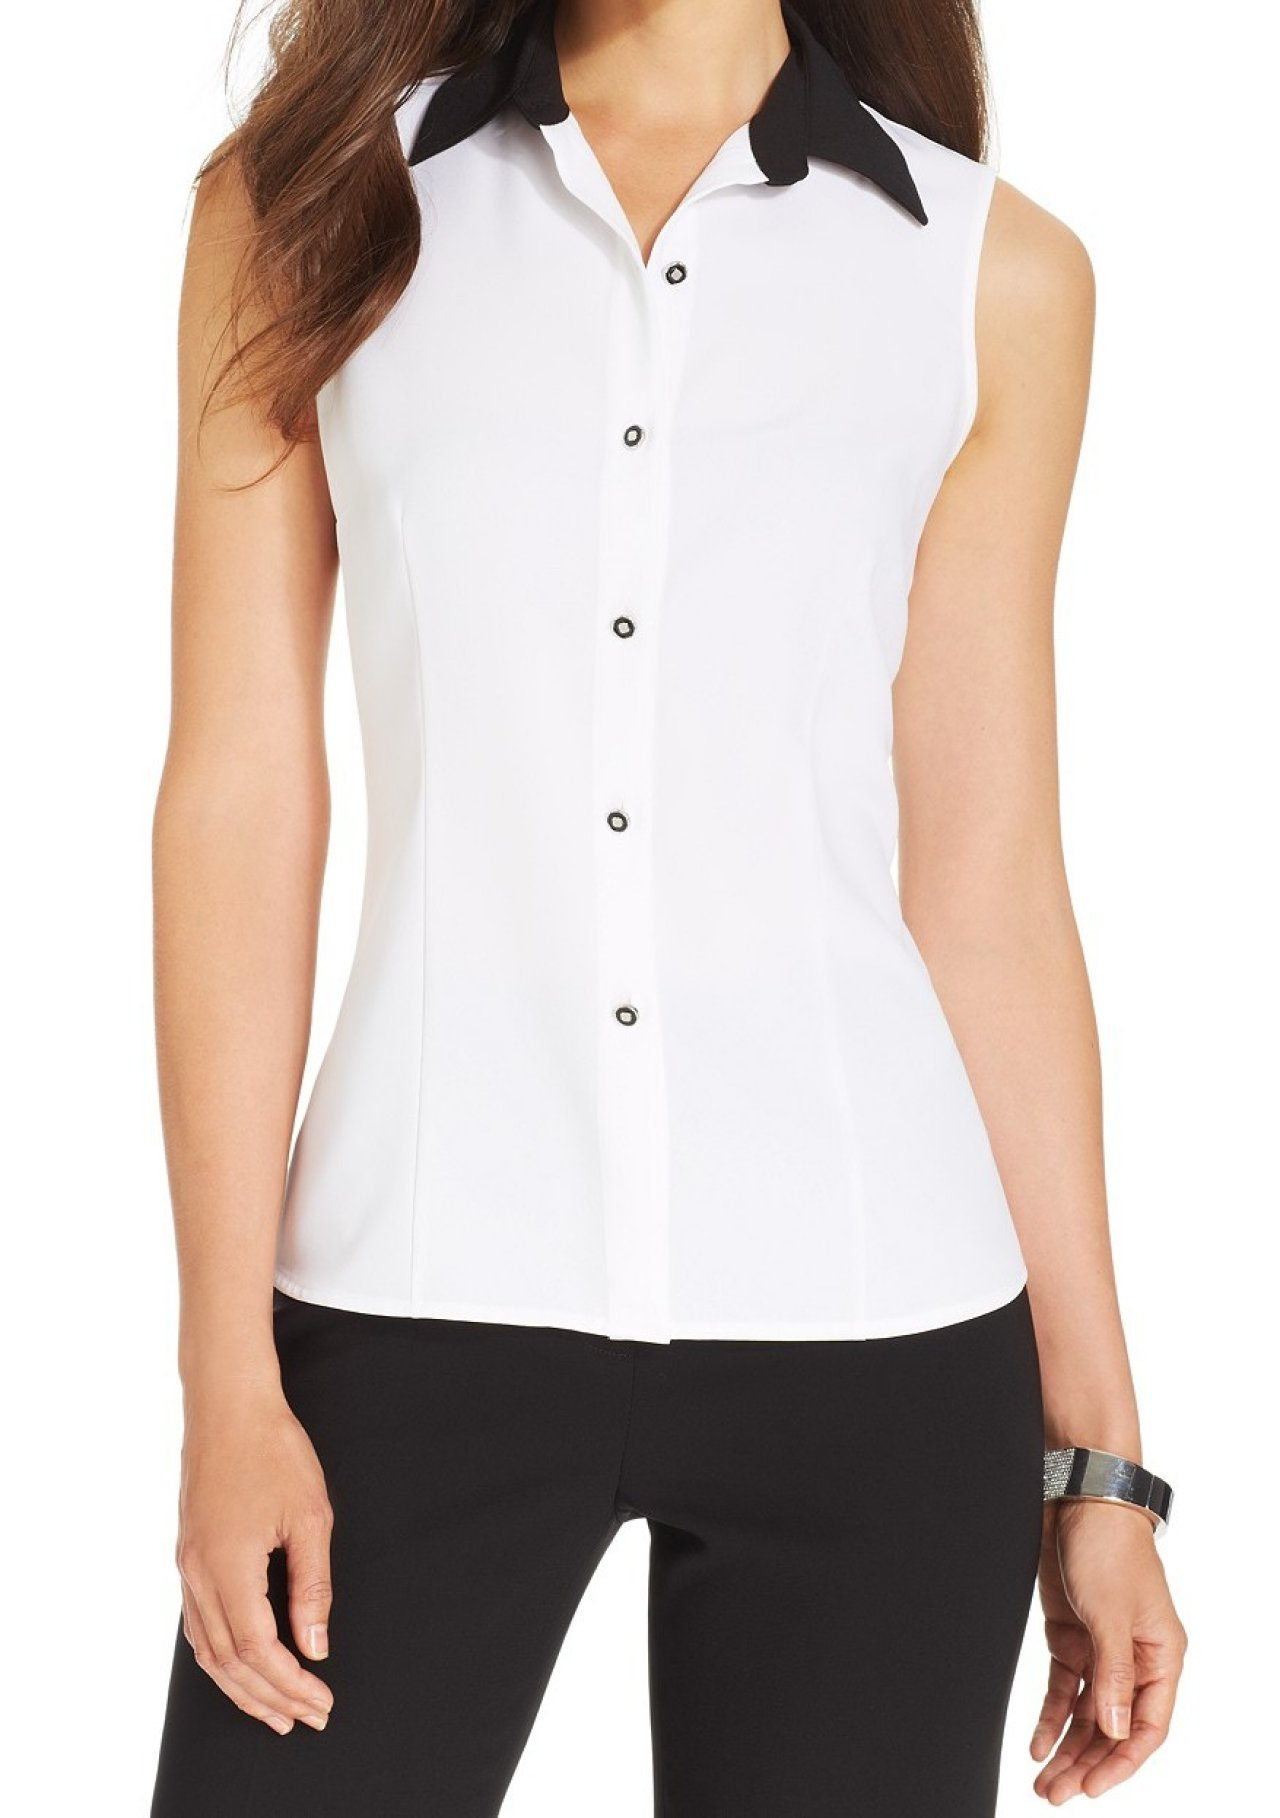 d06585216d83fb Sleeveless White Collared Button Down Shirt - BCD Tofu House